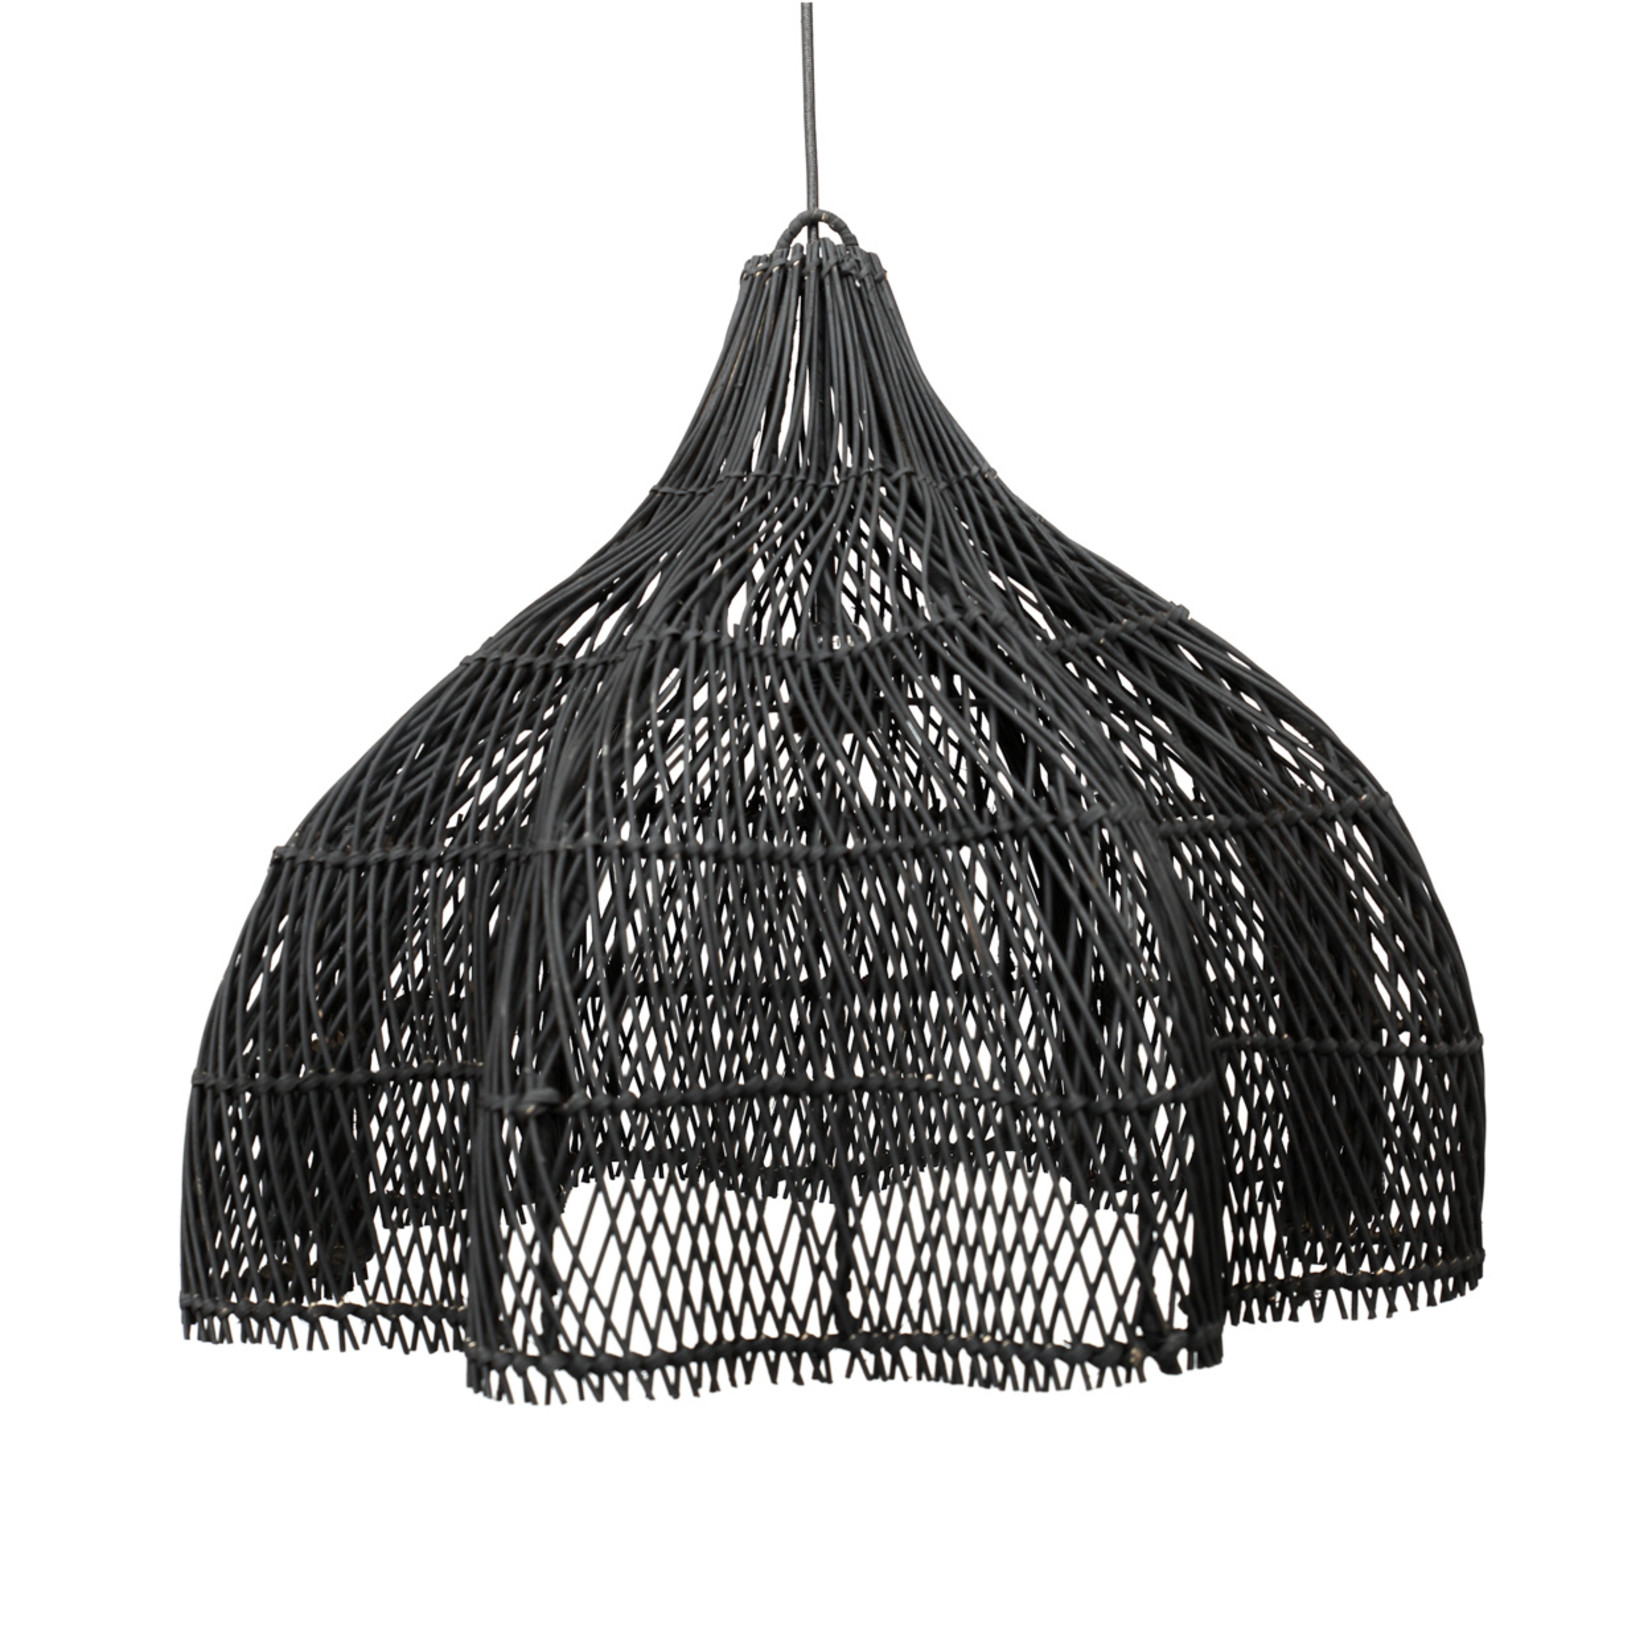 Bazar Bizar De Whipped Hanglamp - Zwart - M